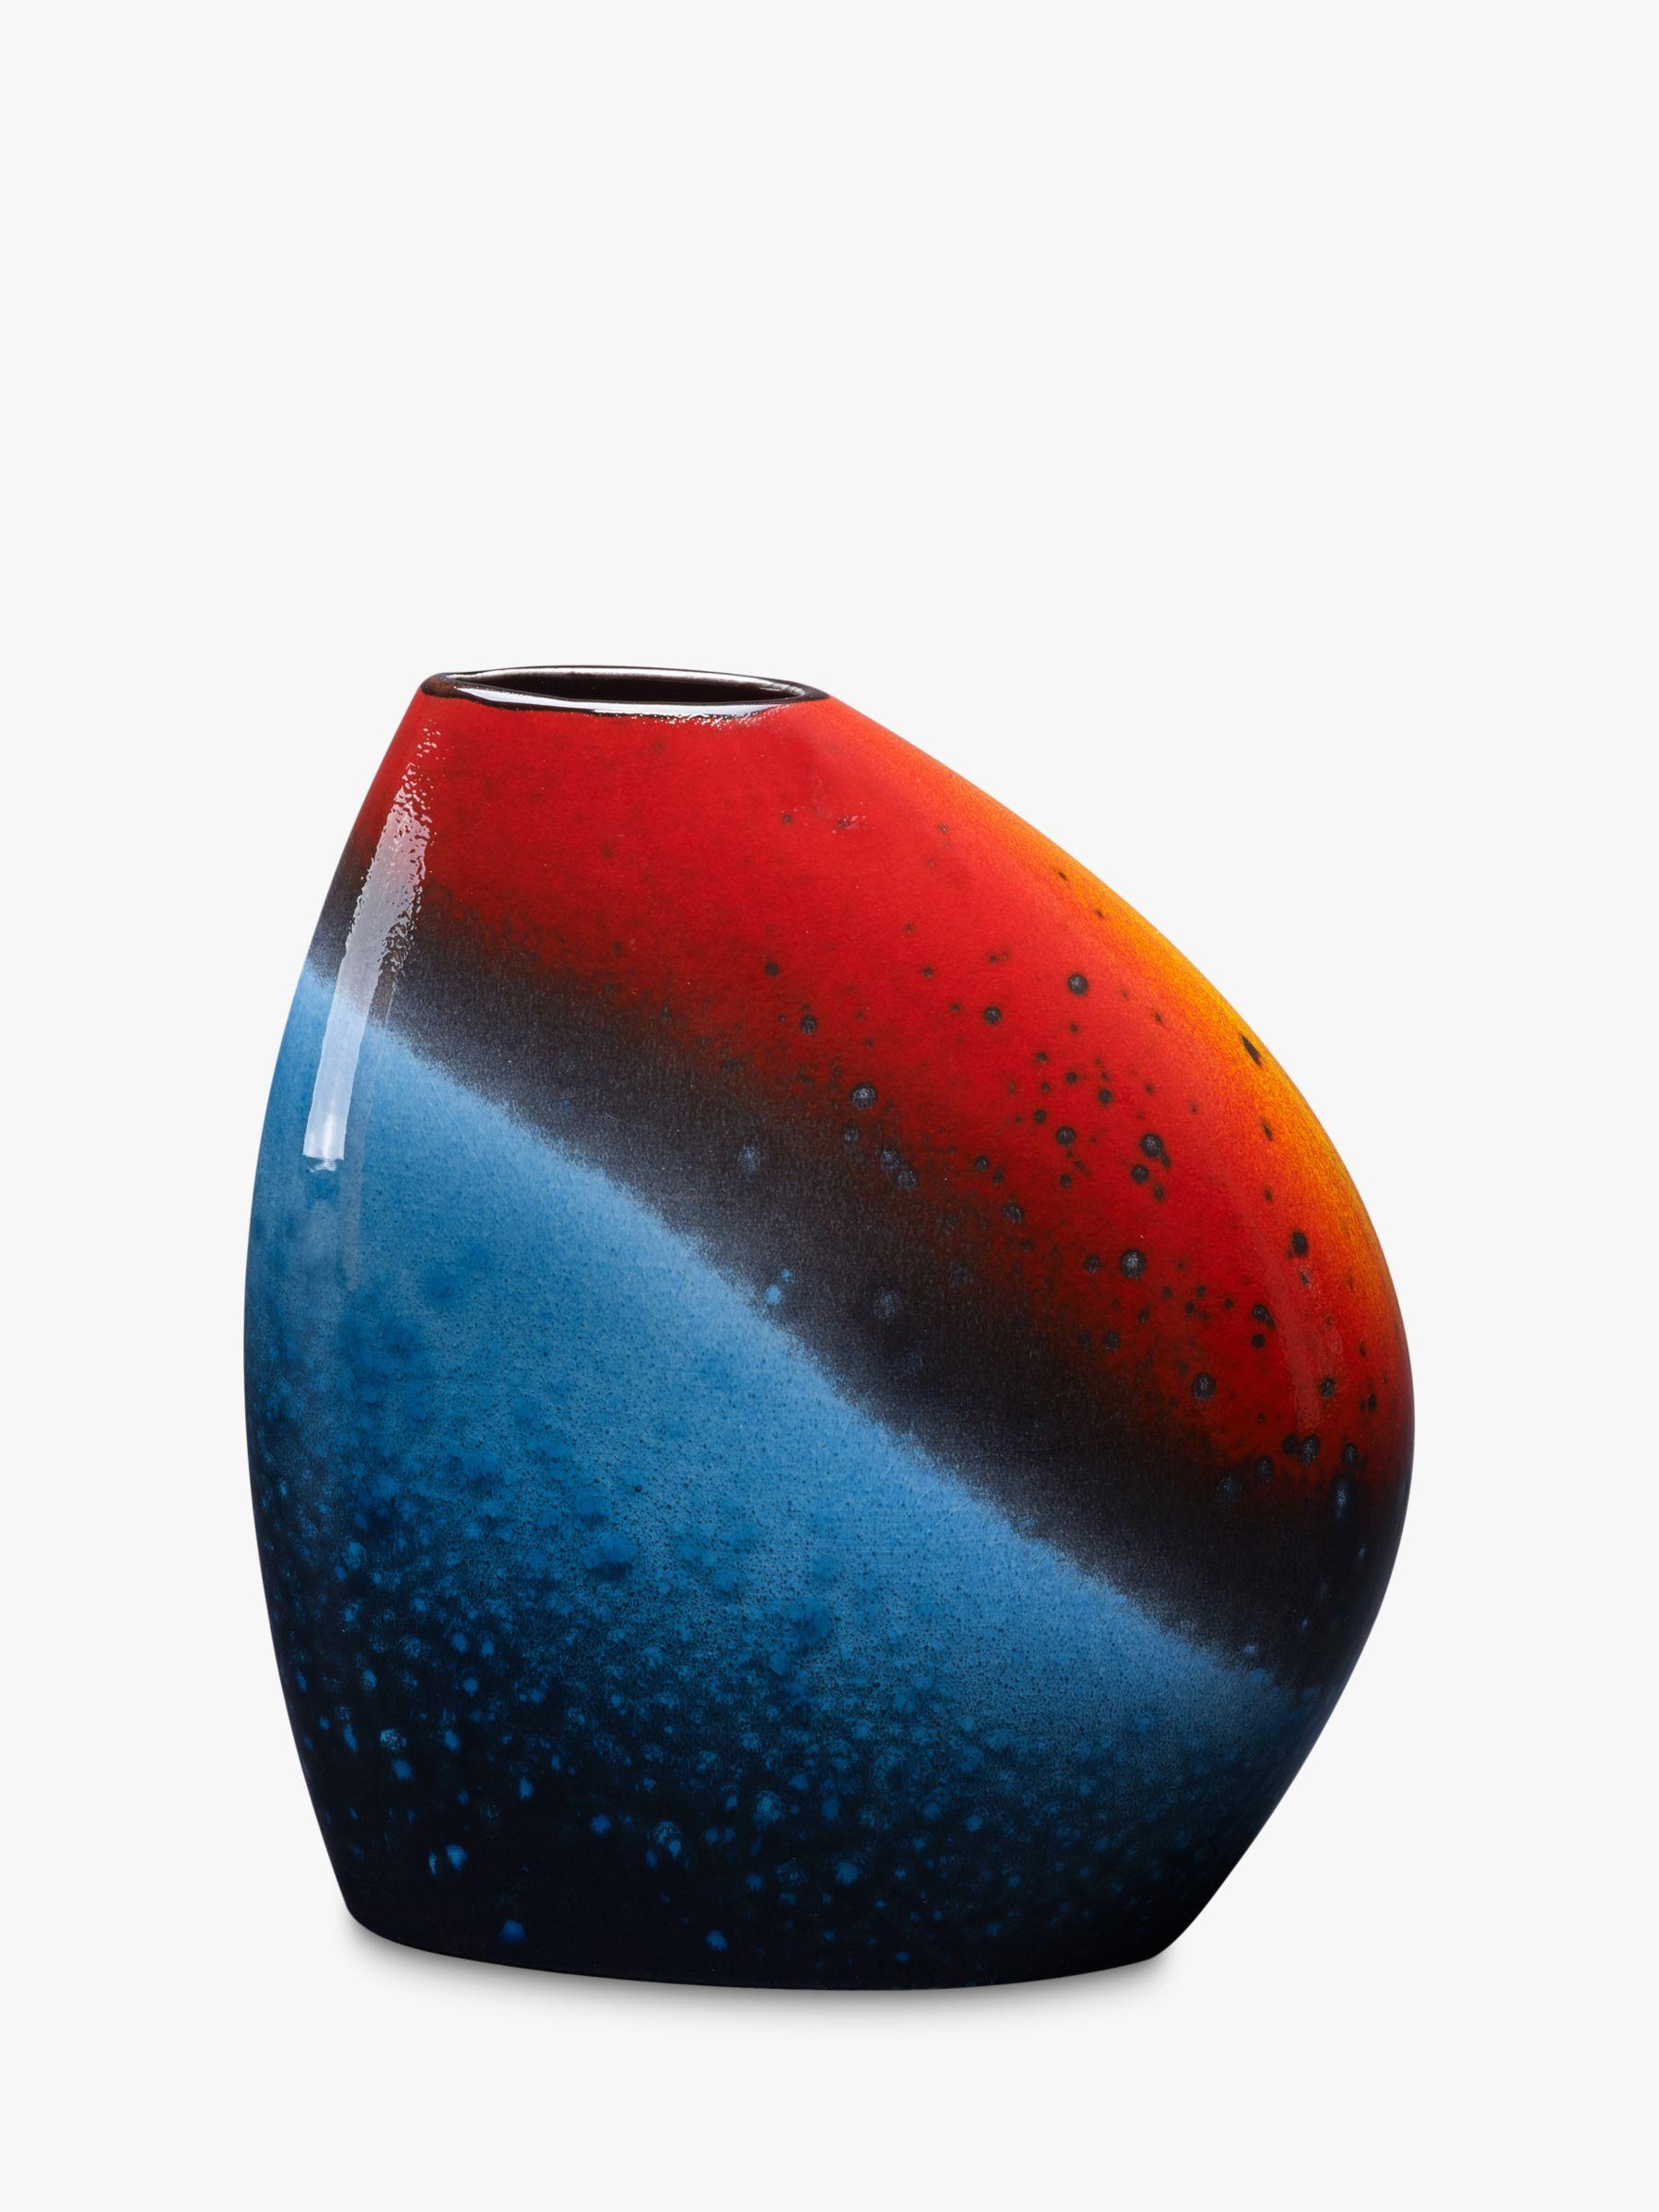 Poole Pottery Poole Pottery Flare Asymmetrical Bean Vase, H19cm